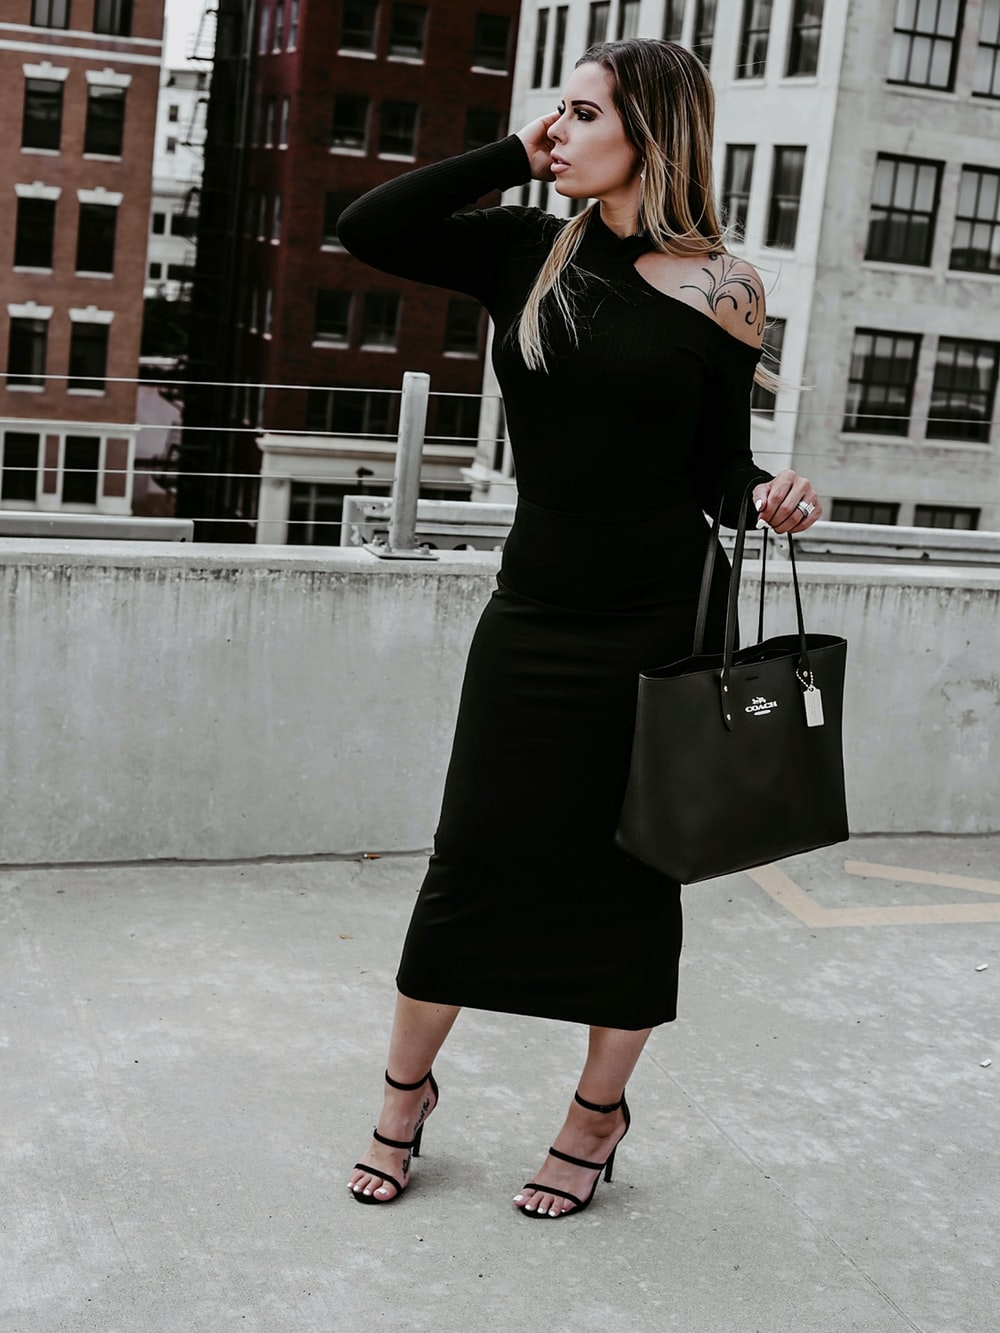 woman in black long sleeve dress holding black leather handbag